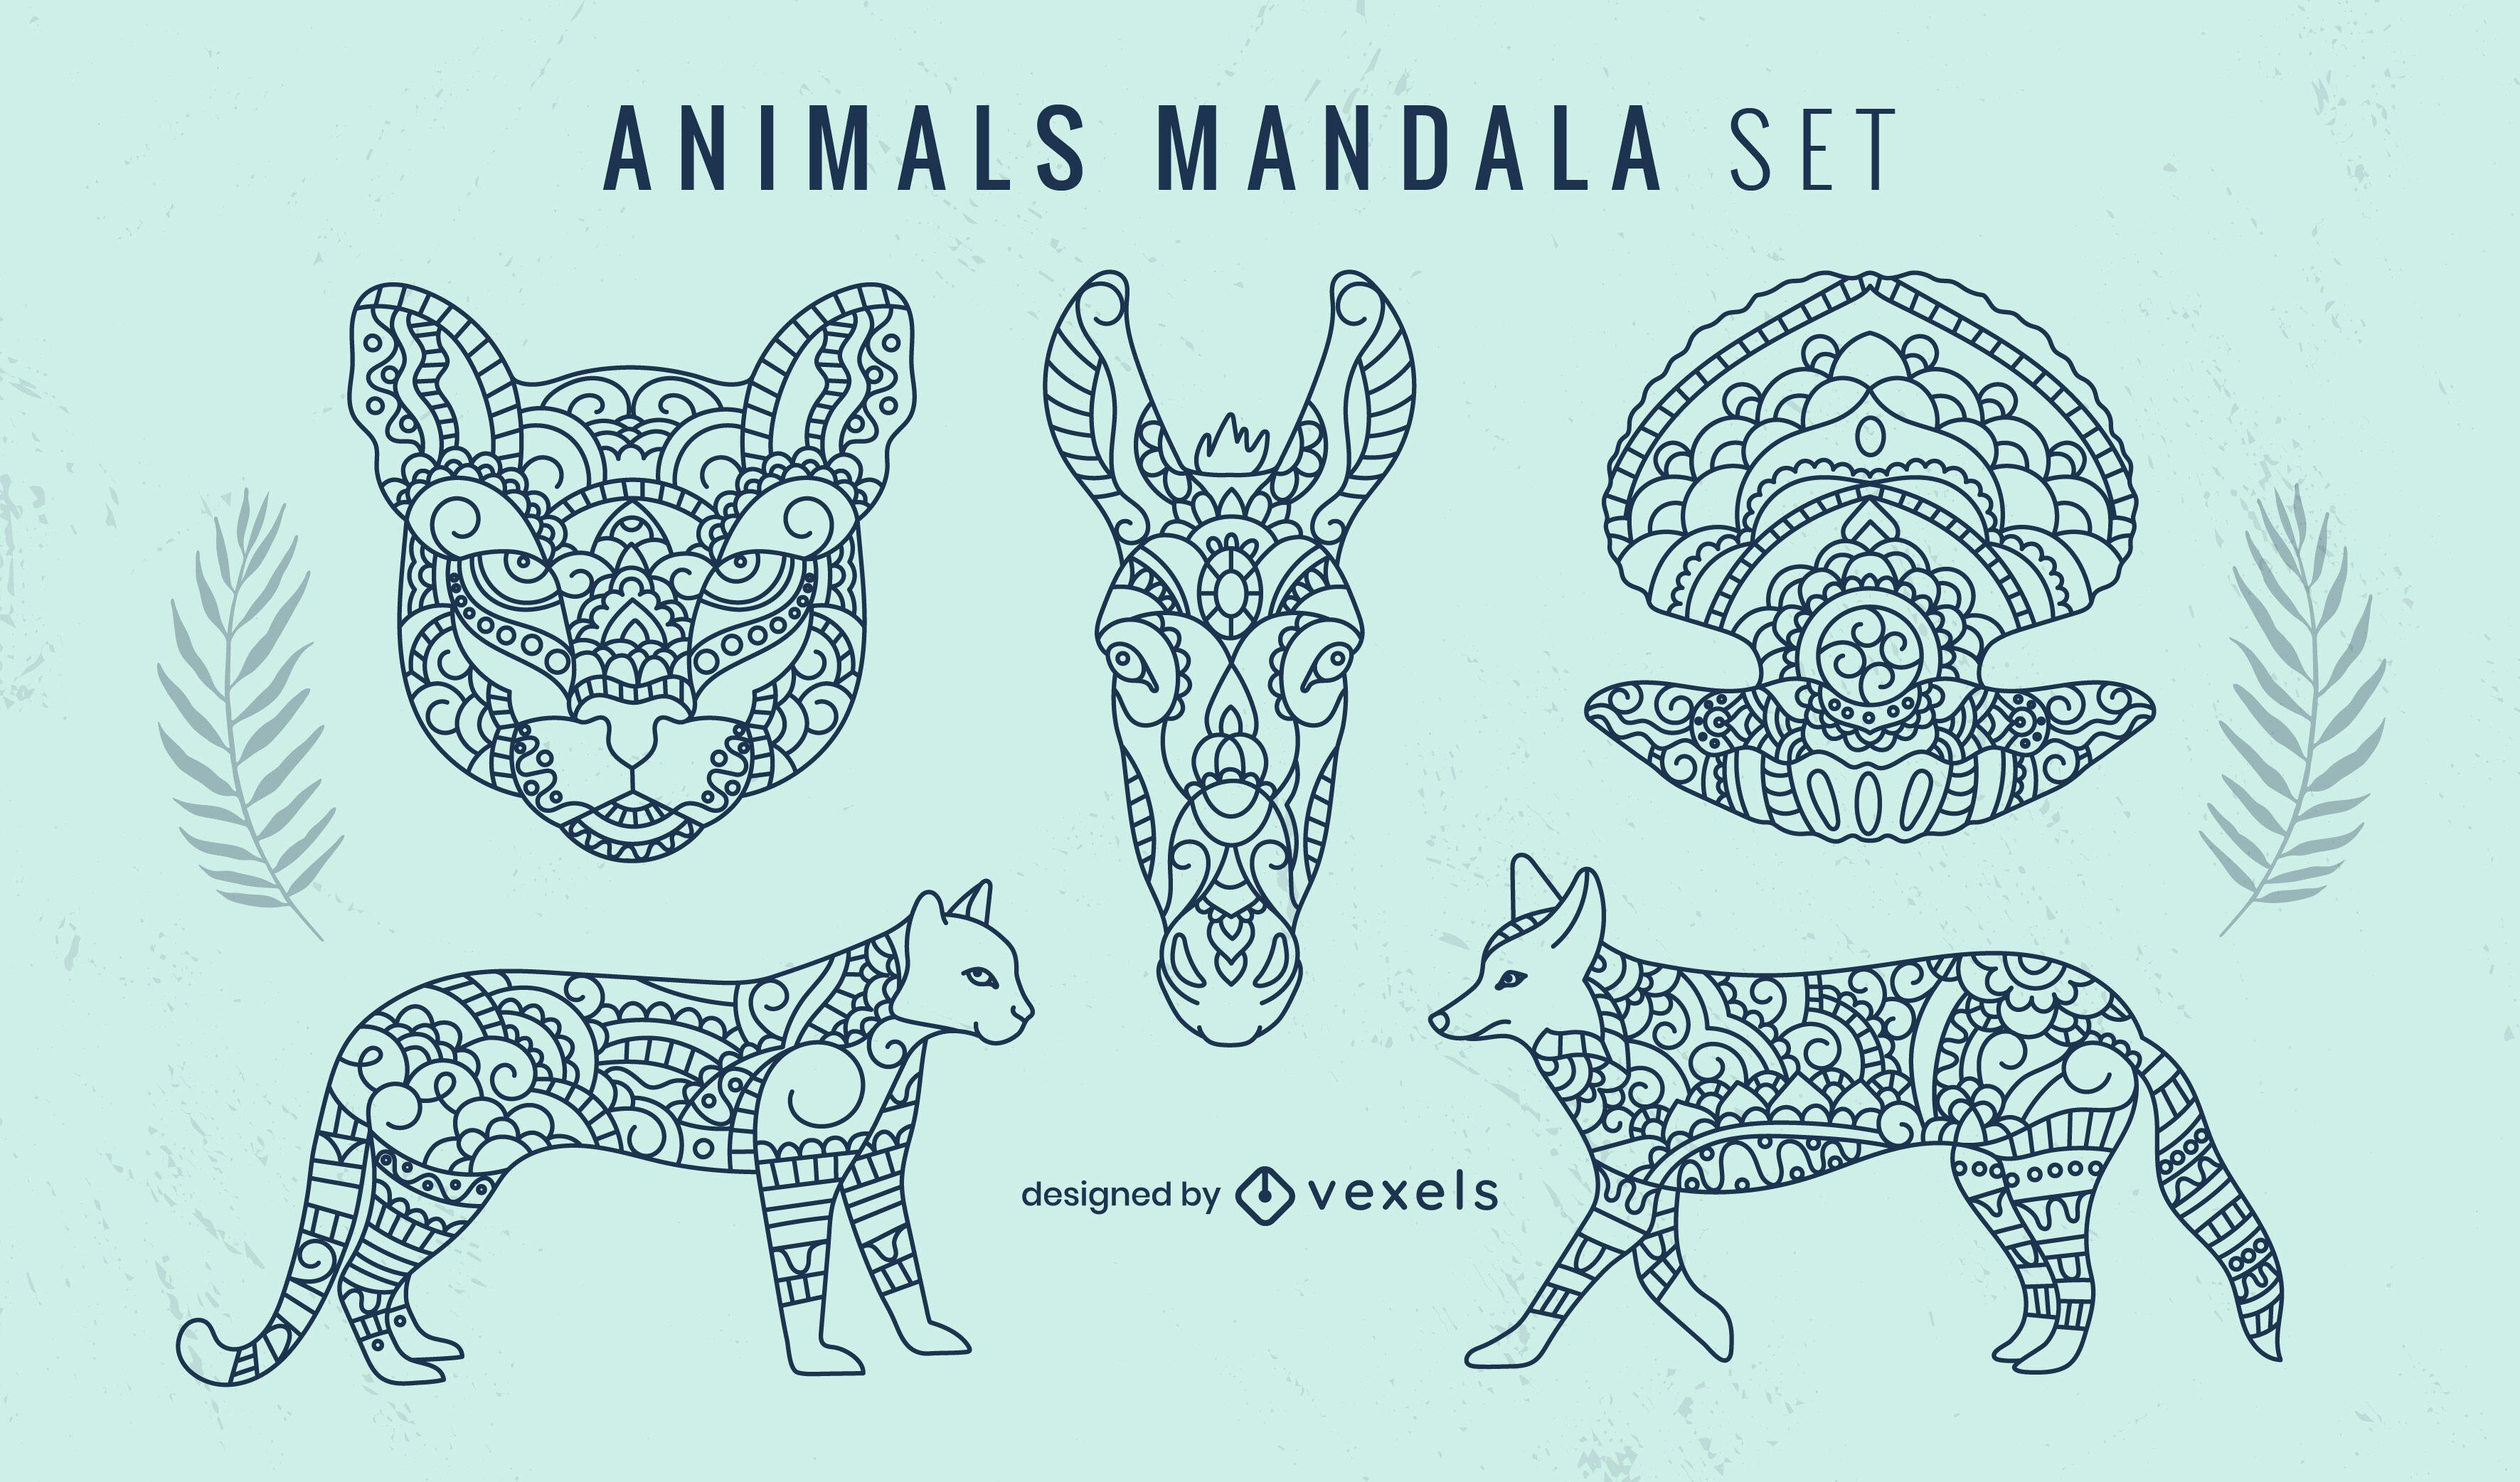 Animal mandala decorative set